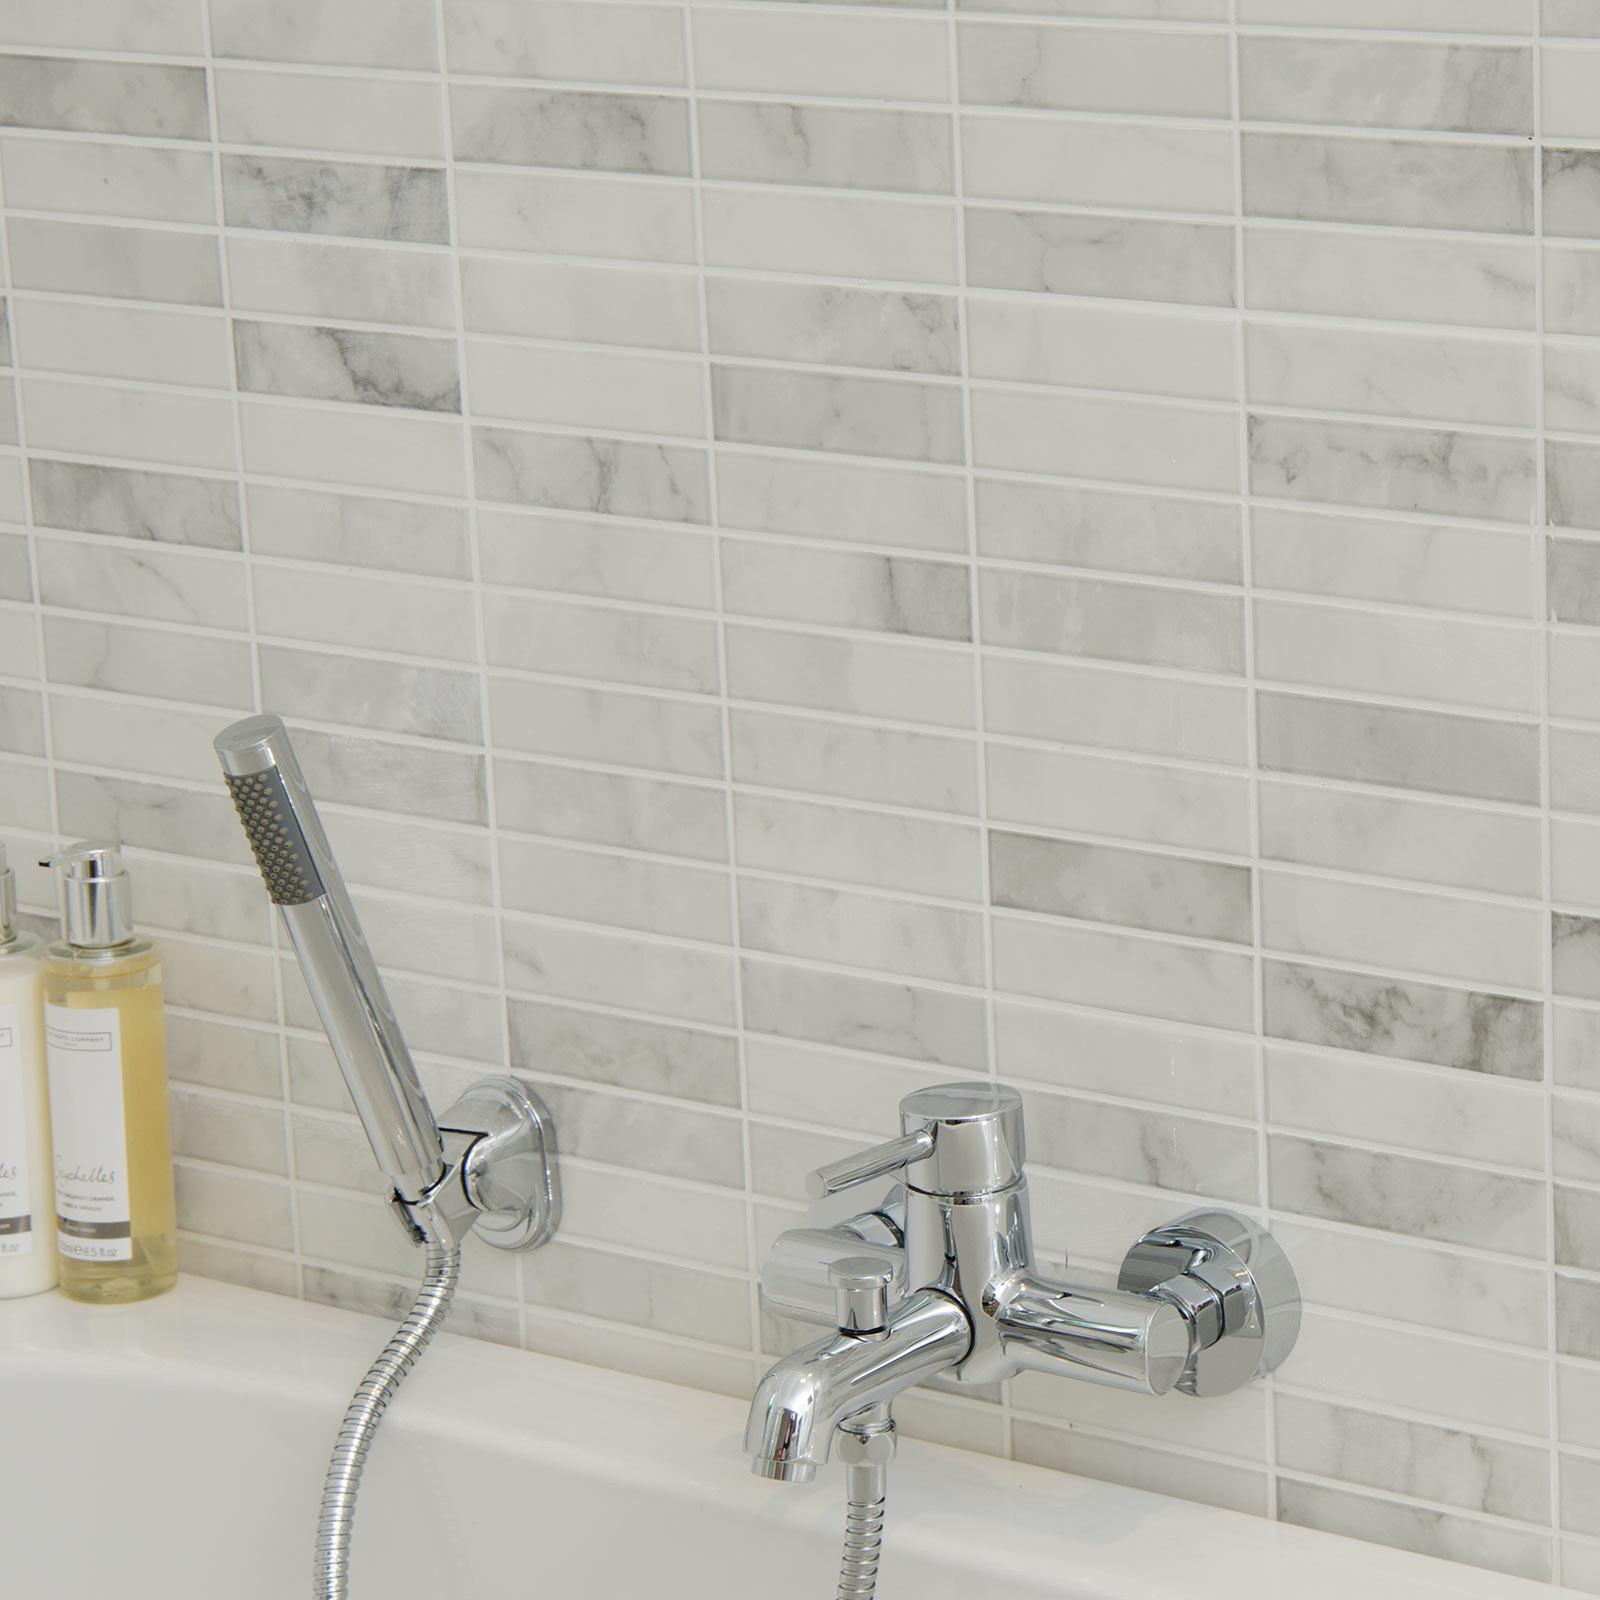 How To Clean Bathroom Wall Tiles Easily: Carrara Brillo Pre-Scored Wall Tile